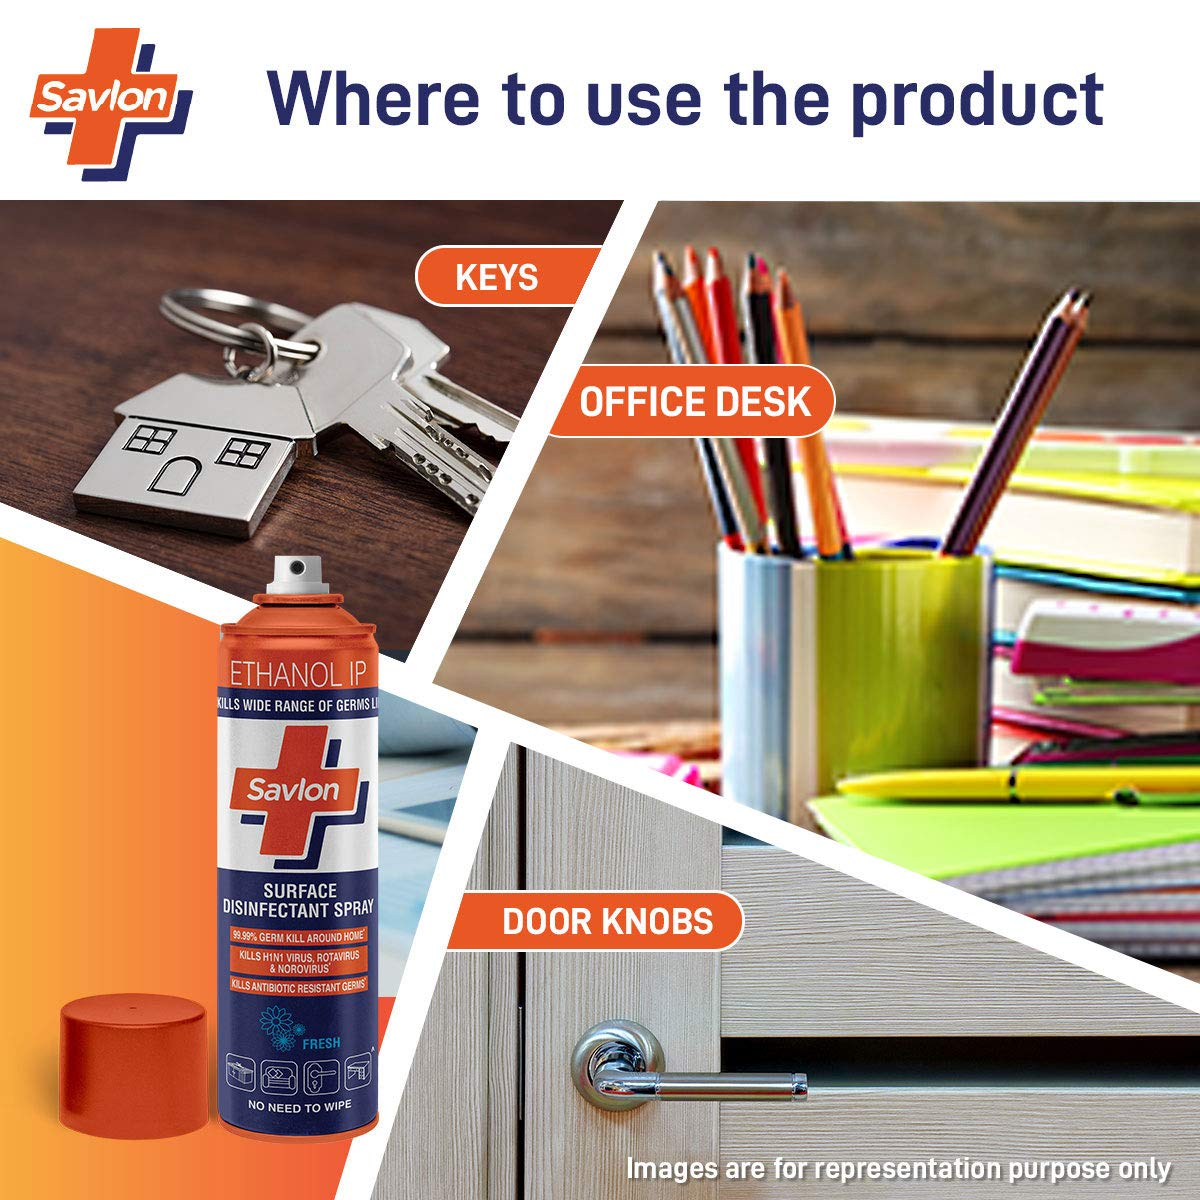 Savlon Surface Disinfectant Spray(170gm)